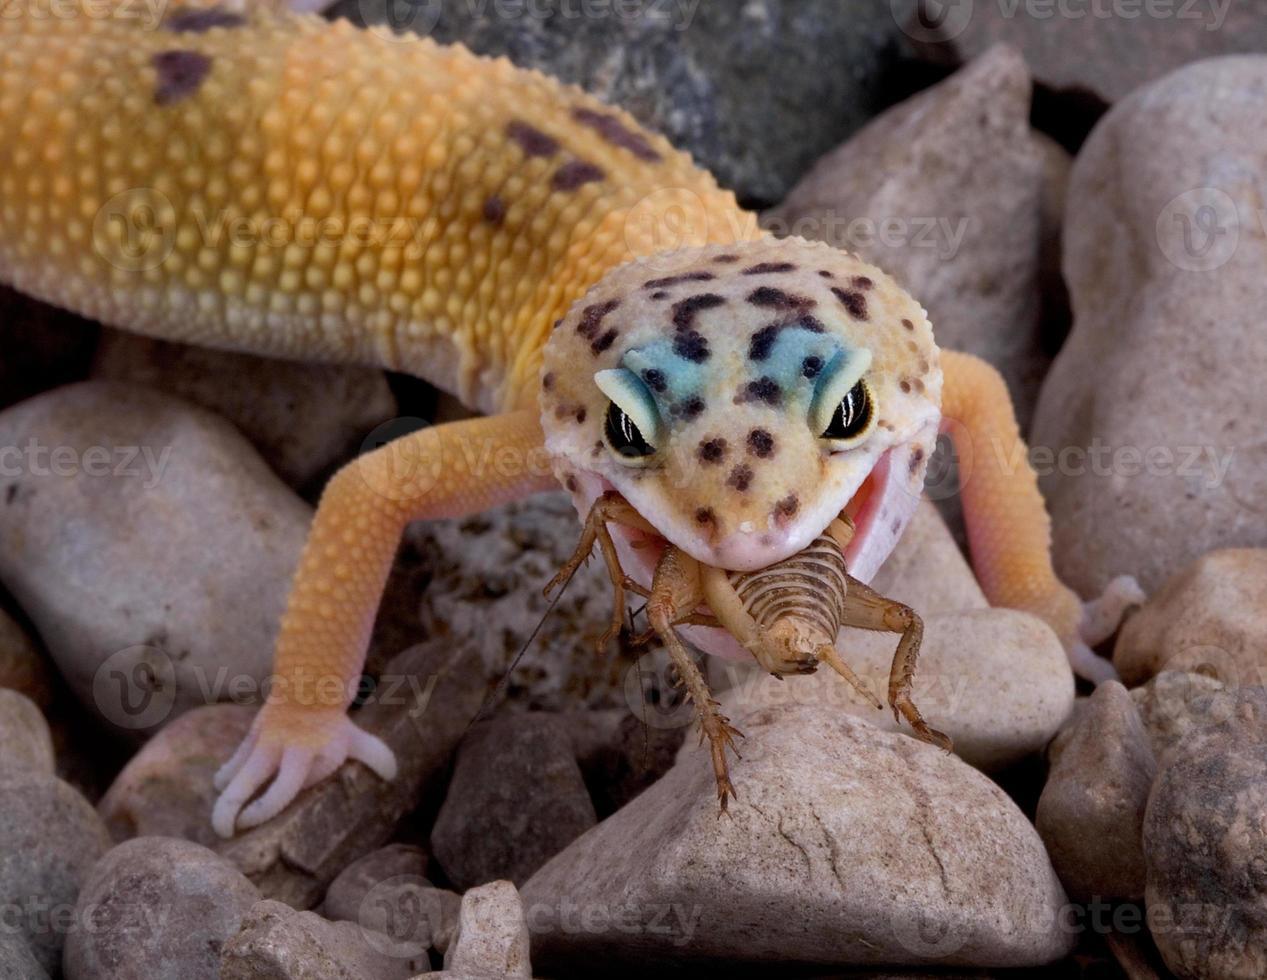 lagartixa leopardo comendo críquete foto